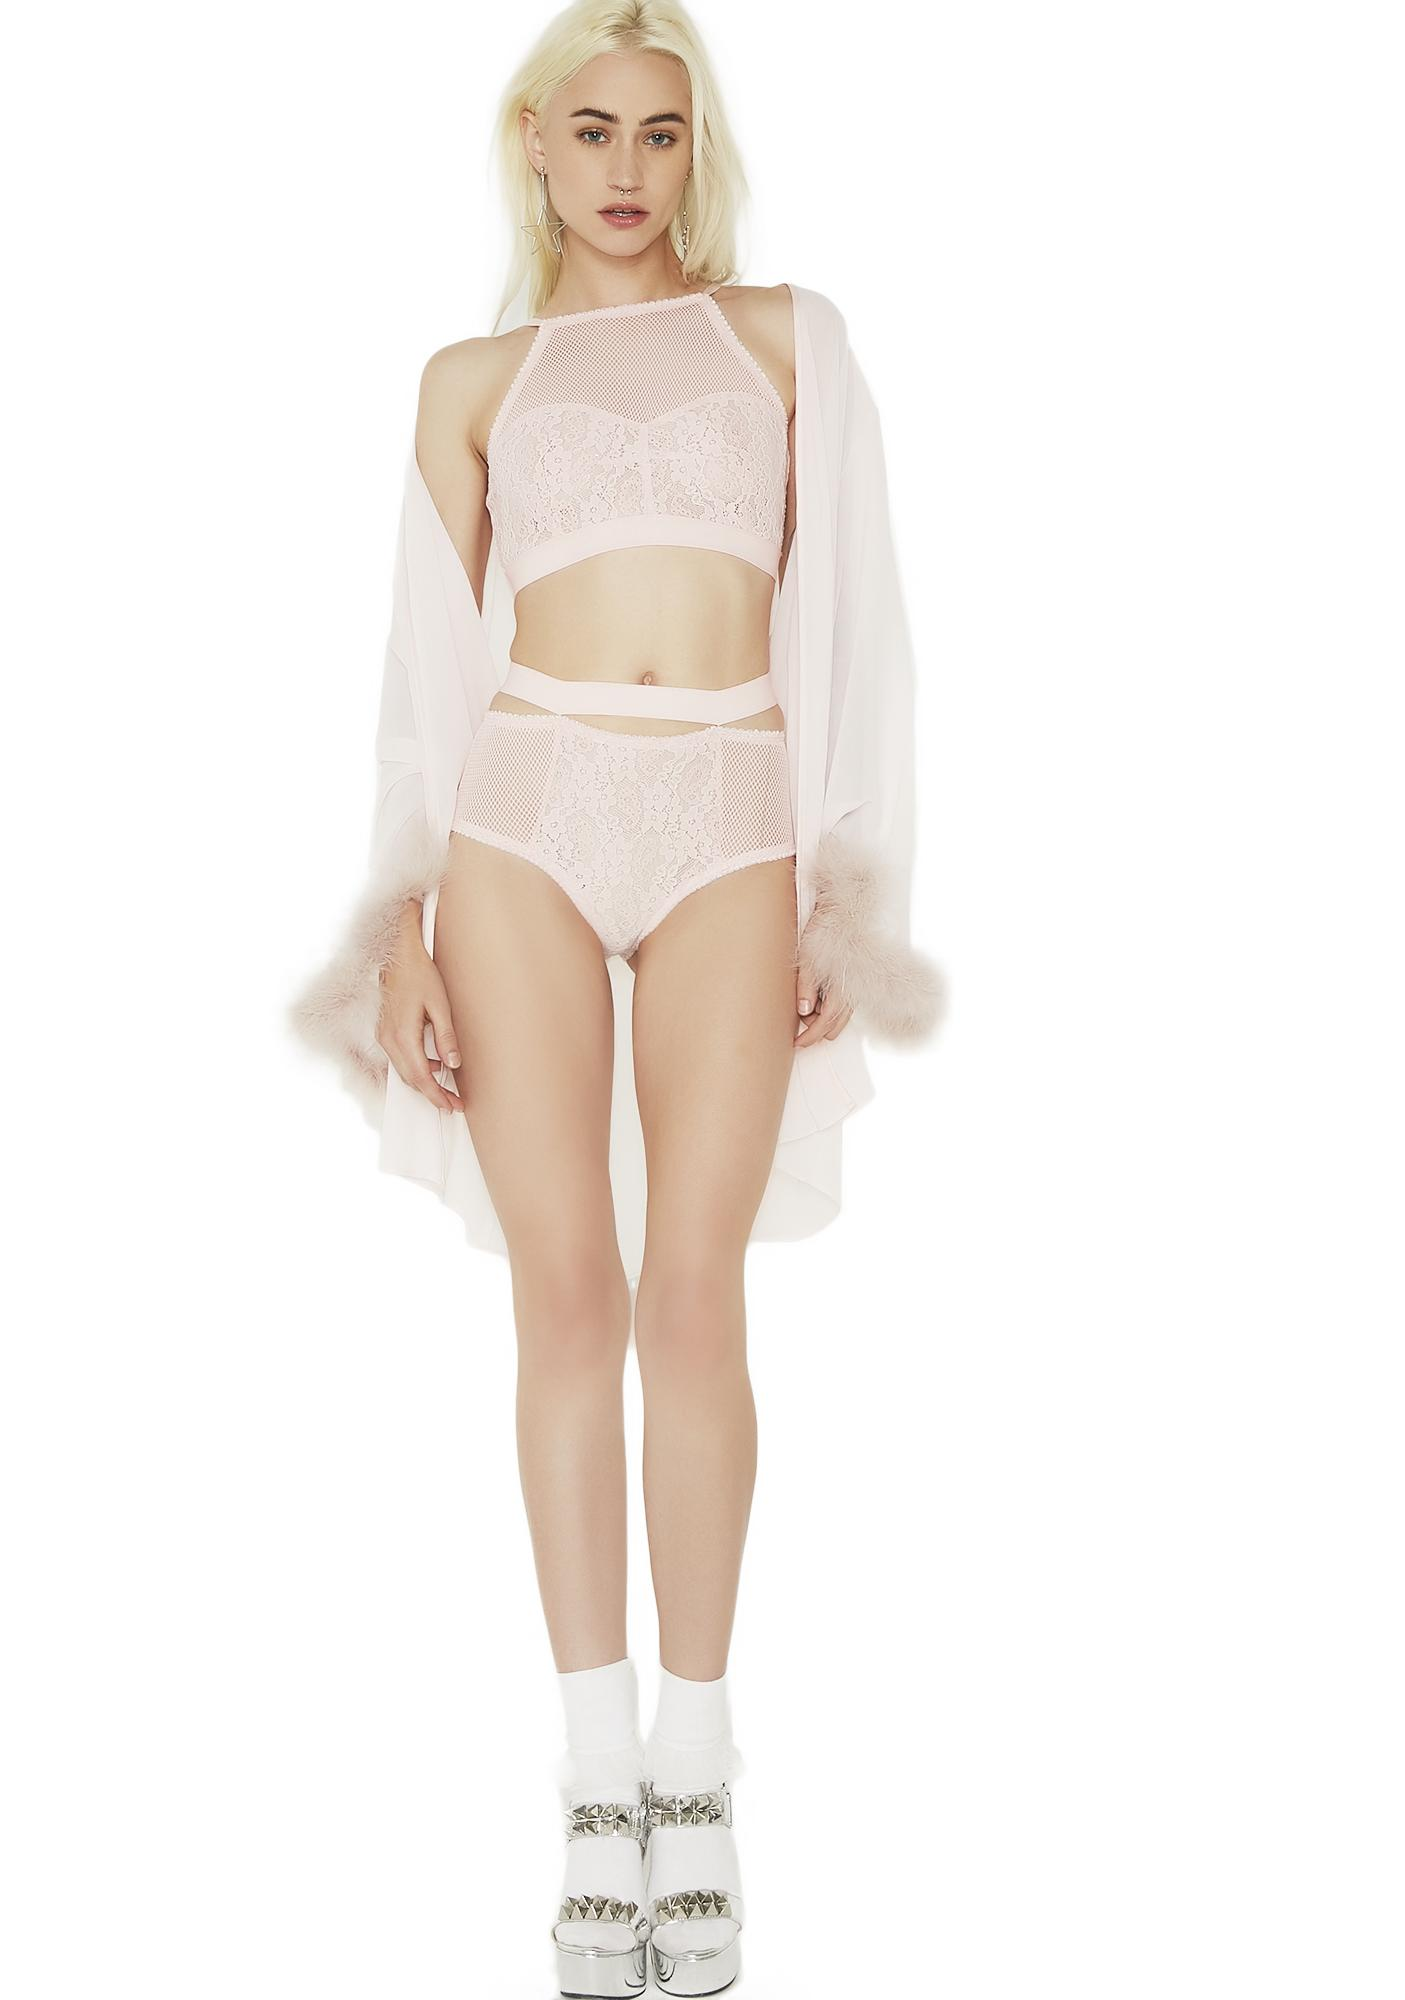 Sheer Fishnet Lace Lingerie Set Pink | Dolls Kill